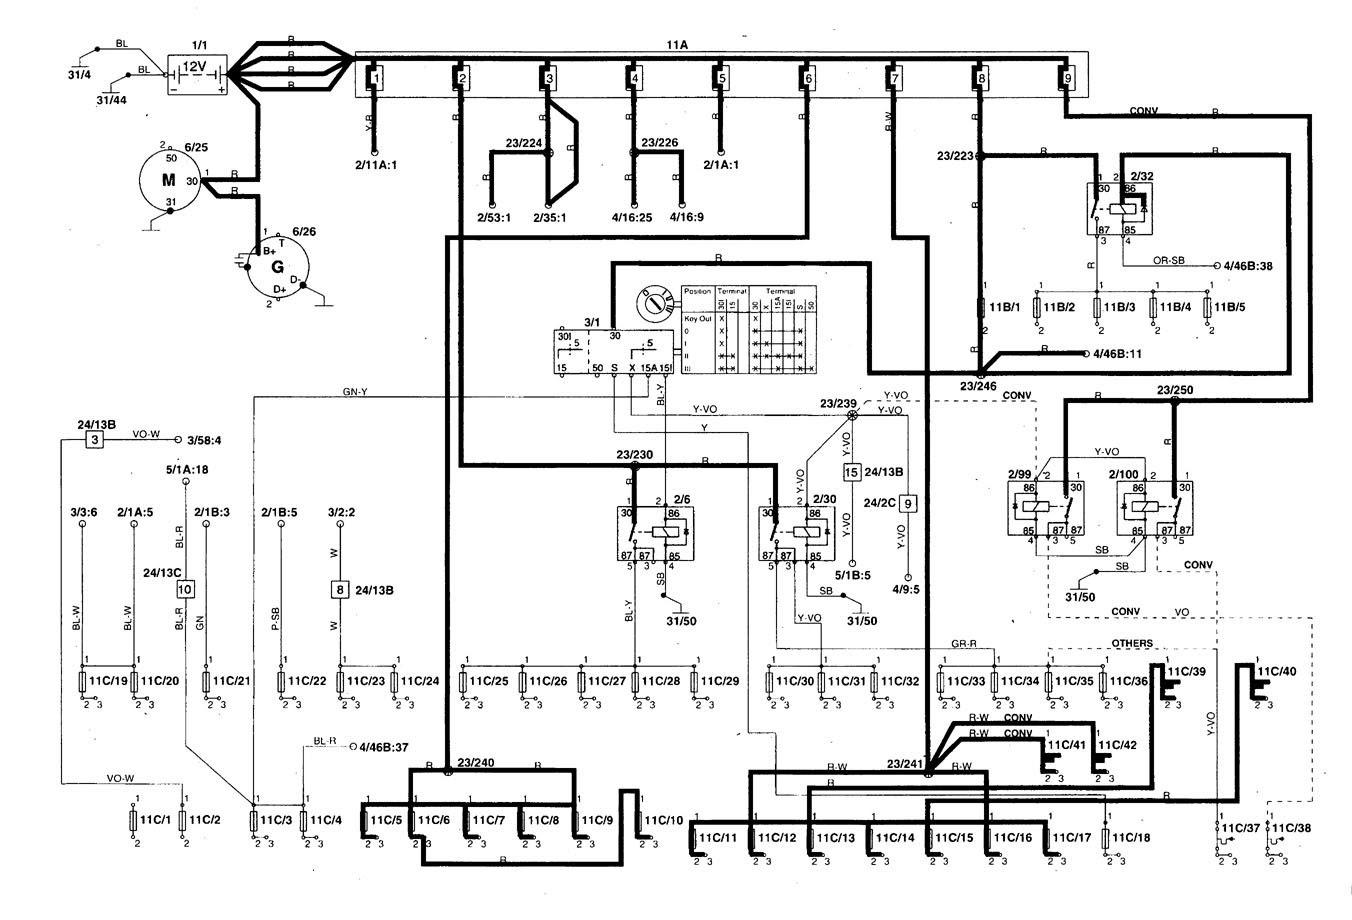 2000 Volvo S70 Fuse Box Diagram